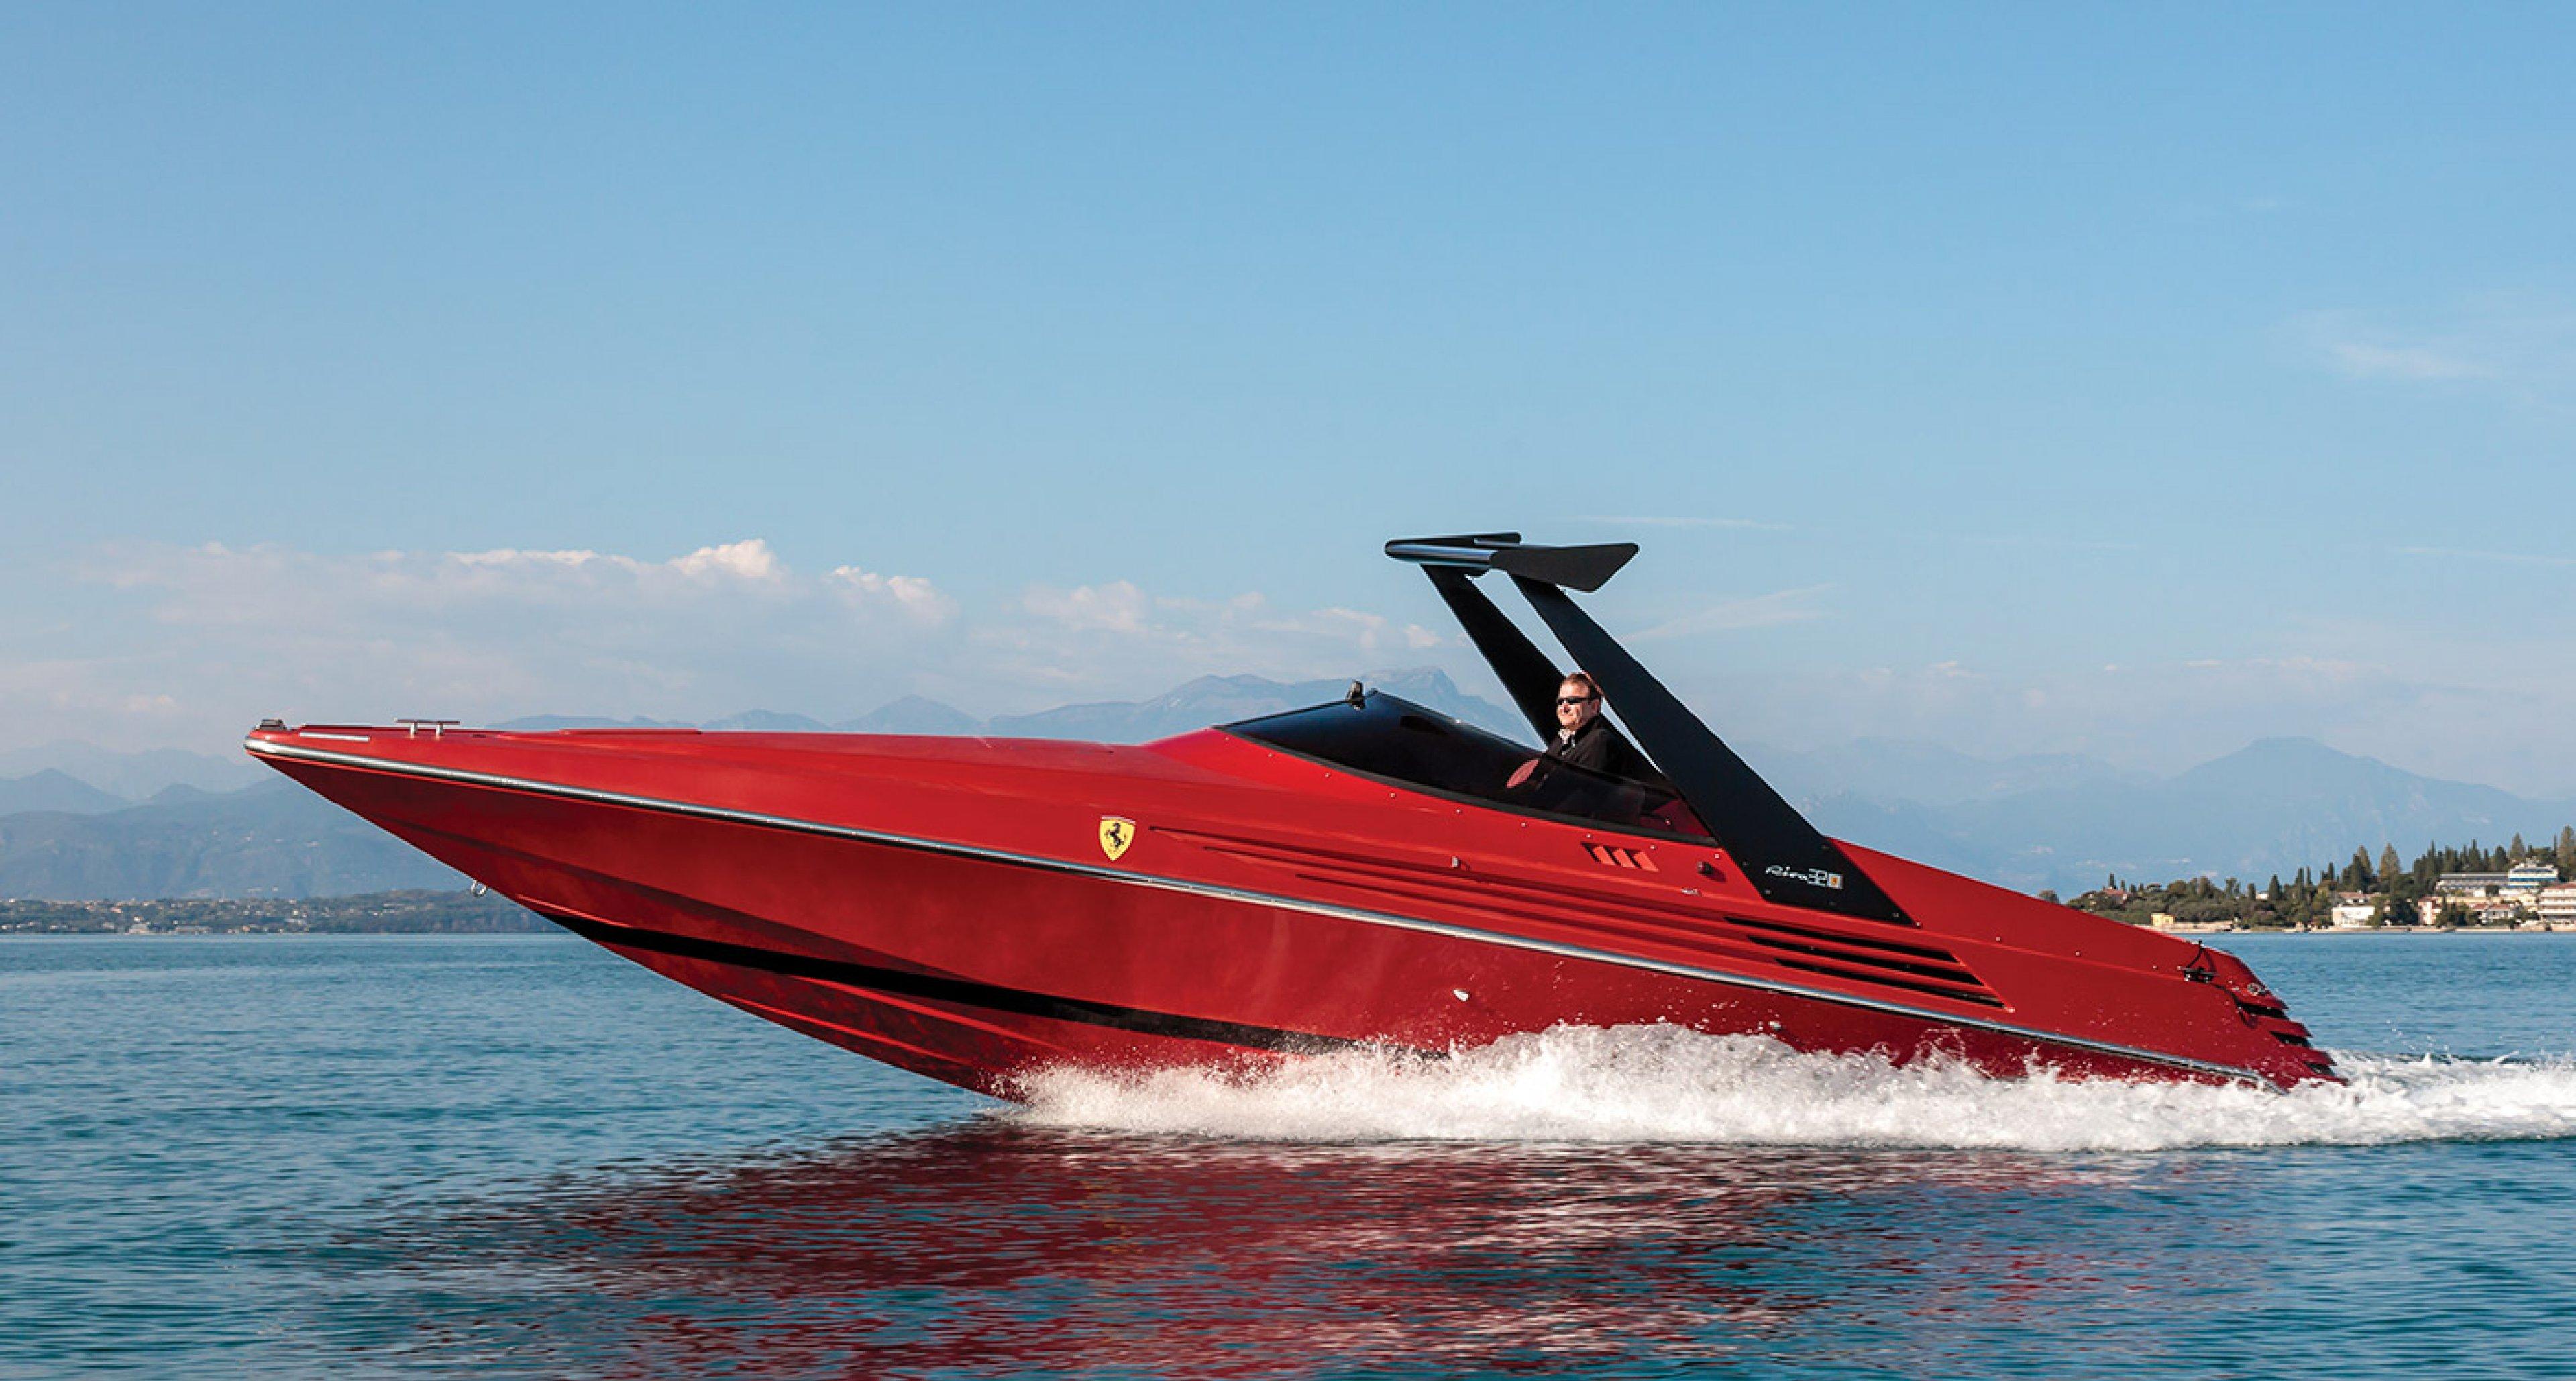 This Riva Ferrari speedboat is a prancing seahorse